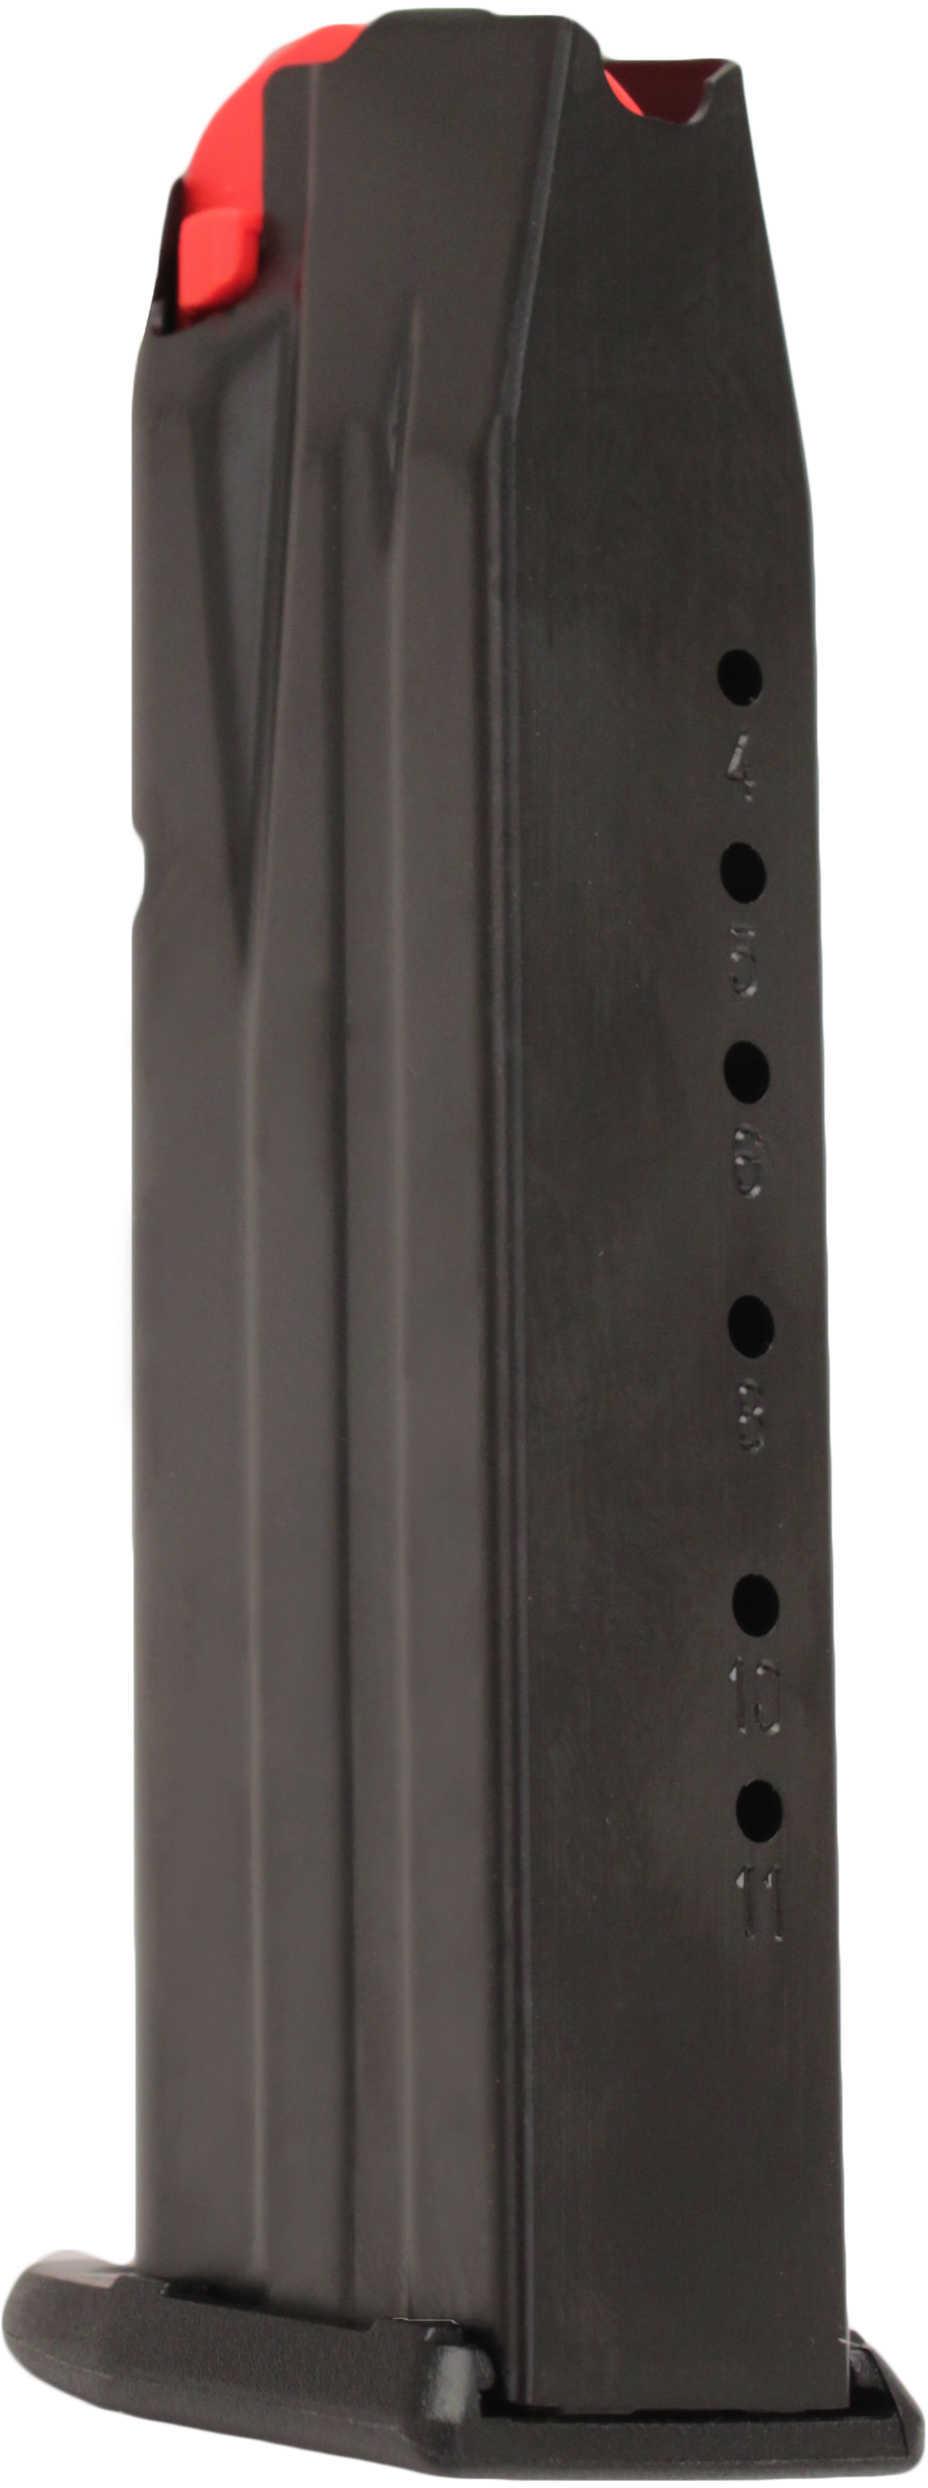 Walther PPQ M2 .40 S&W Magazine 11 Round Md: 2796686